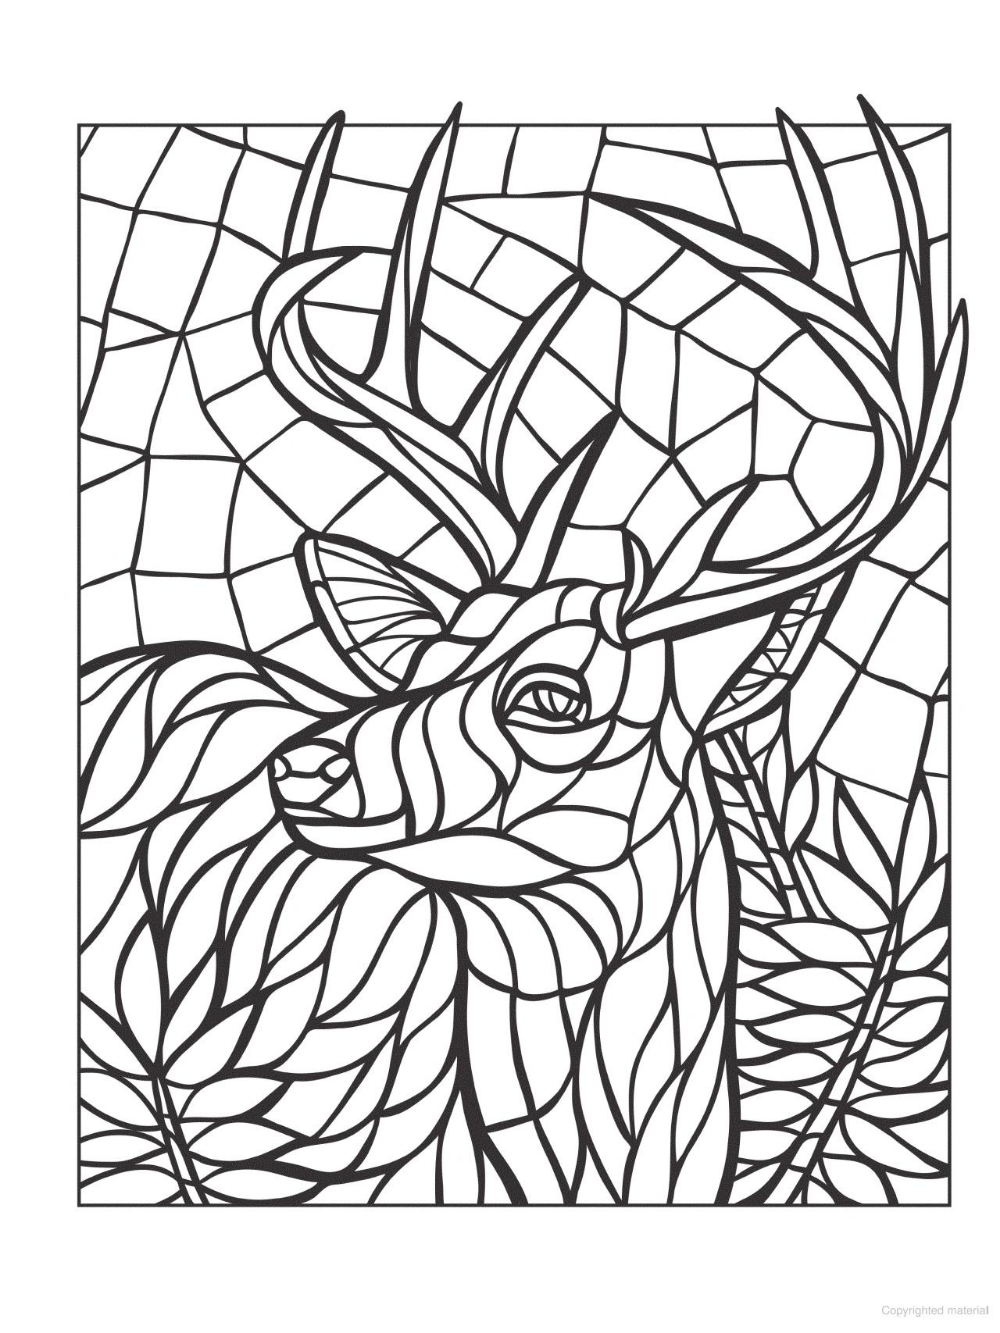 Creative Haven Animal Mosaics Coloring Book Animal Coloring Pages Pattern Coloring Pages Free Mosaic Patterns